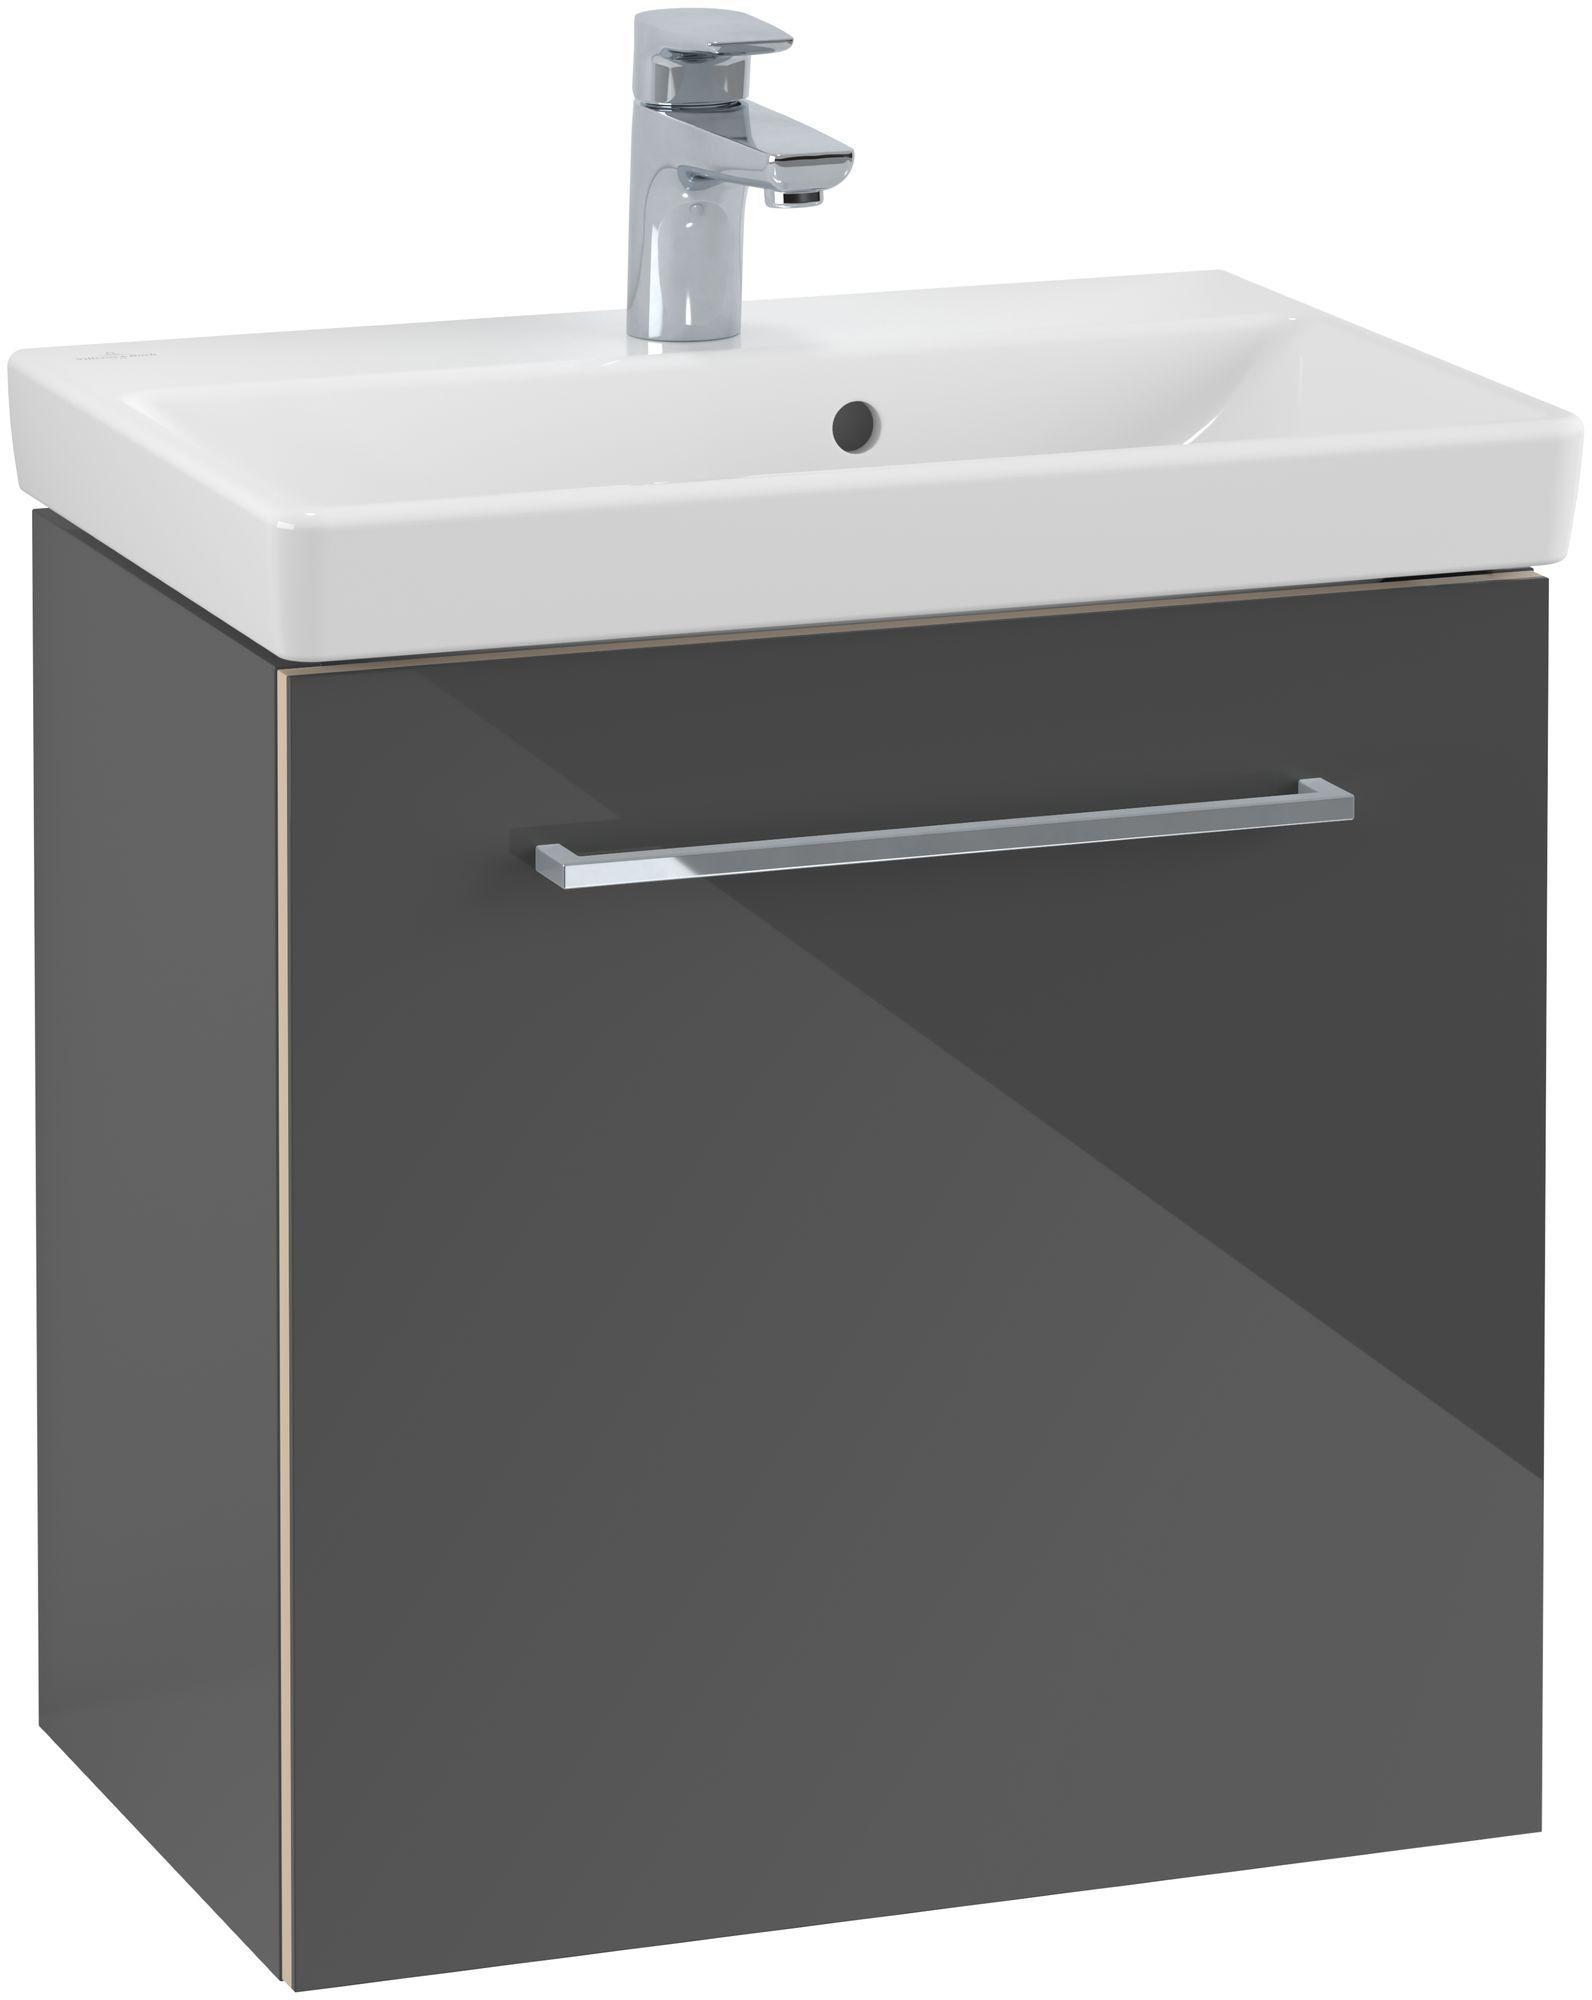 Villeroy & Boch Avento Waschtischunterschrank mit 1 Tür Türanschlag links B:51,2xH:52xT:34,8 cm crystal grey A88800B1